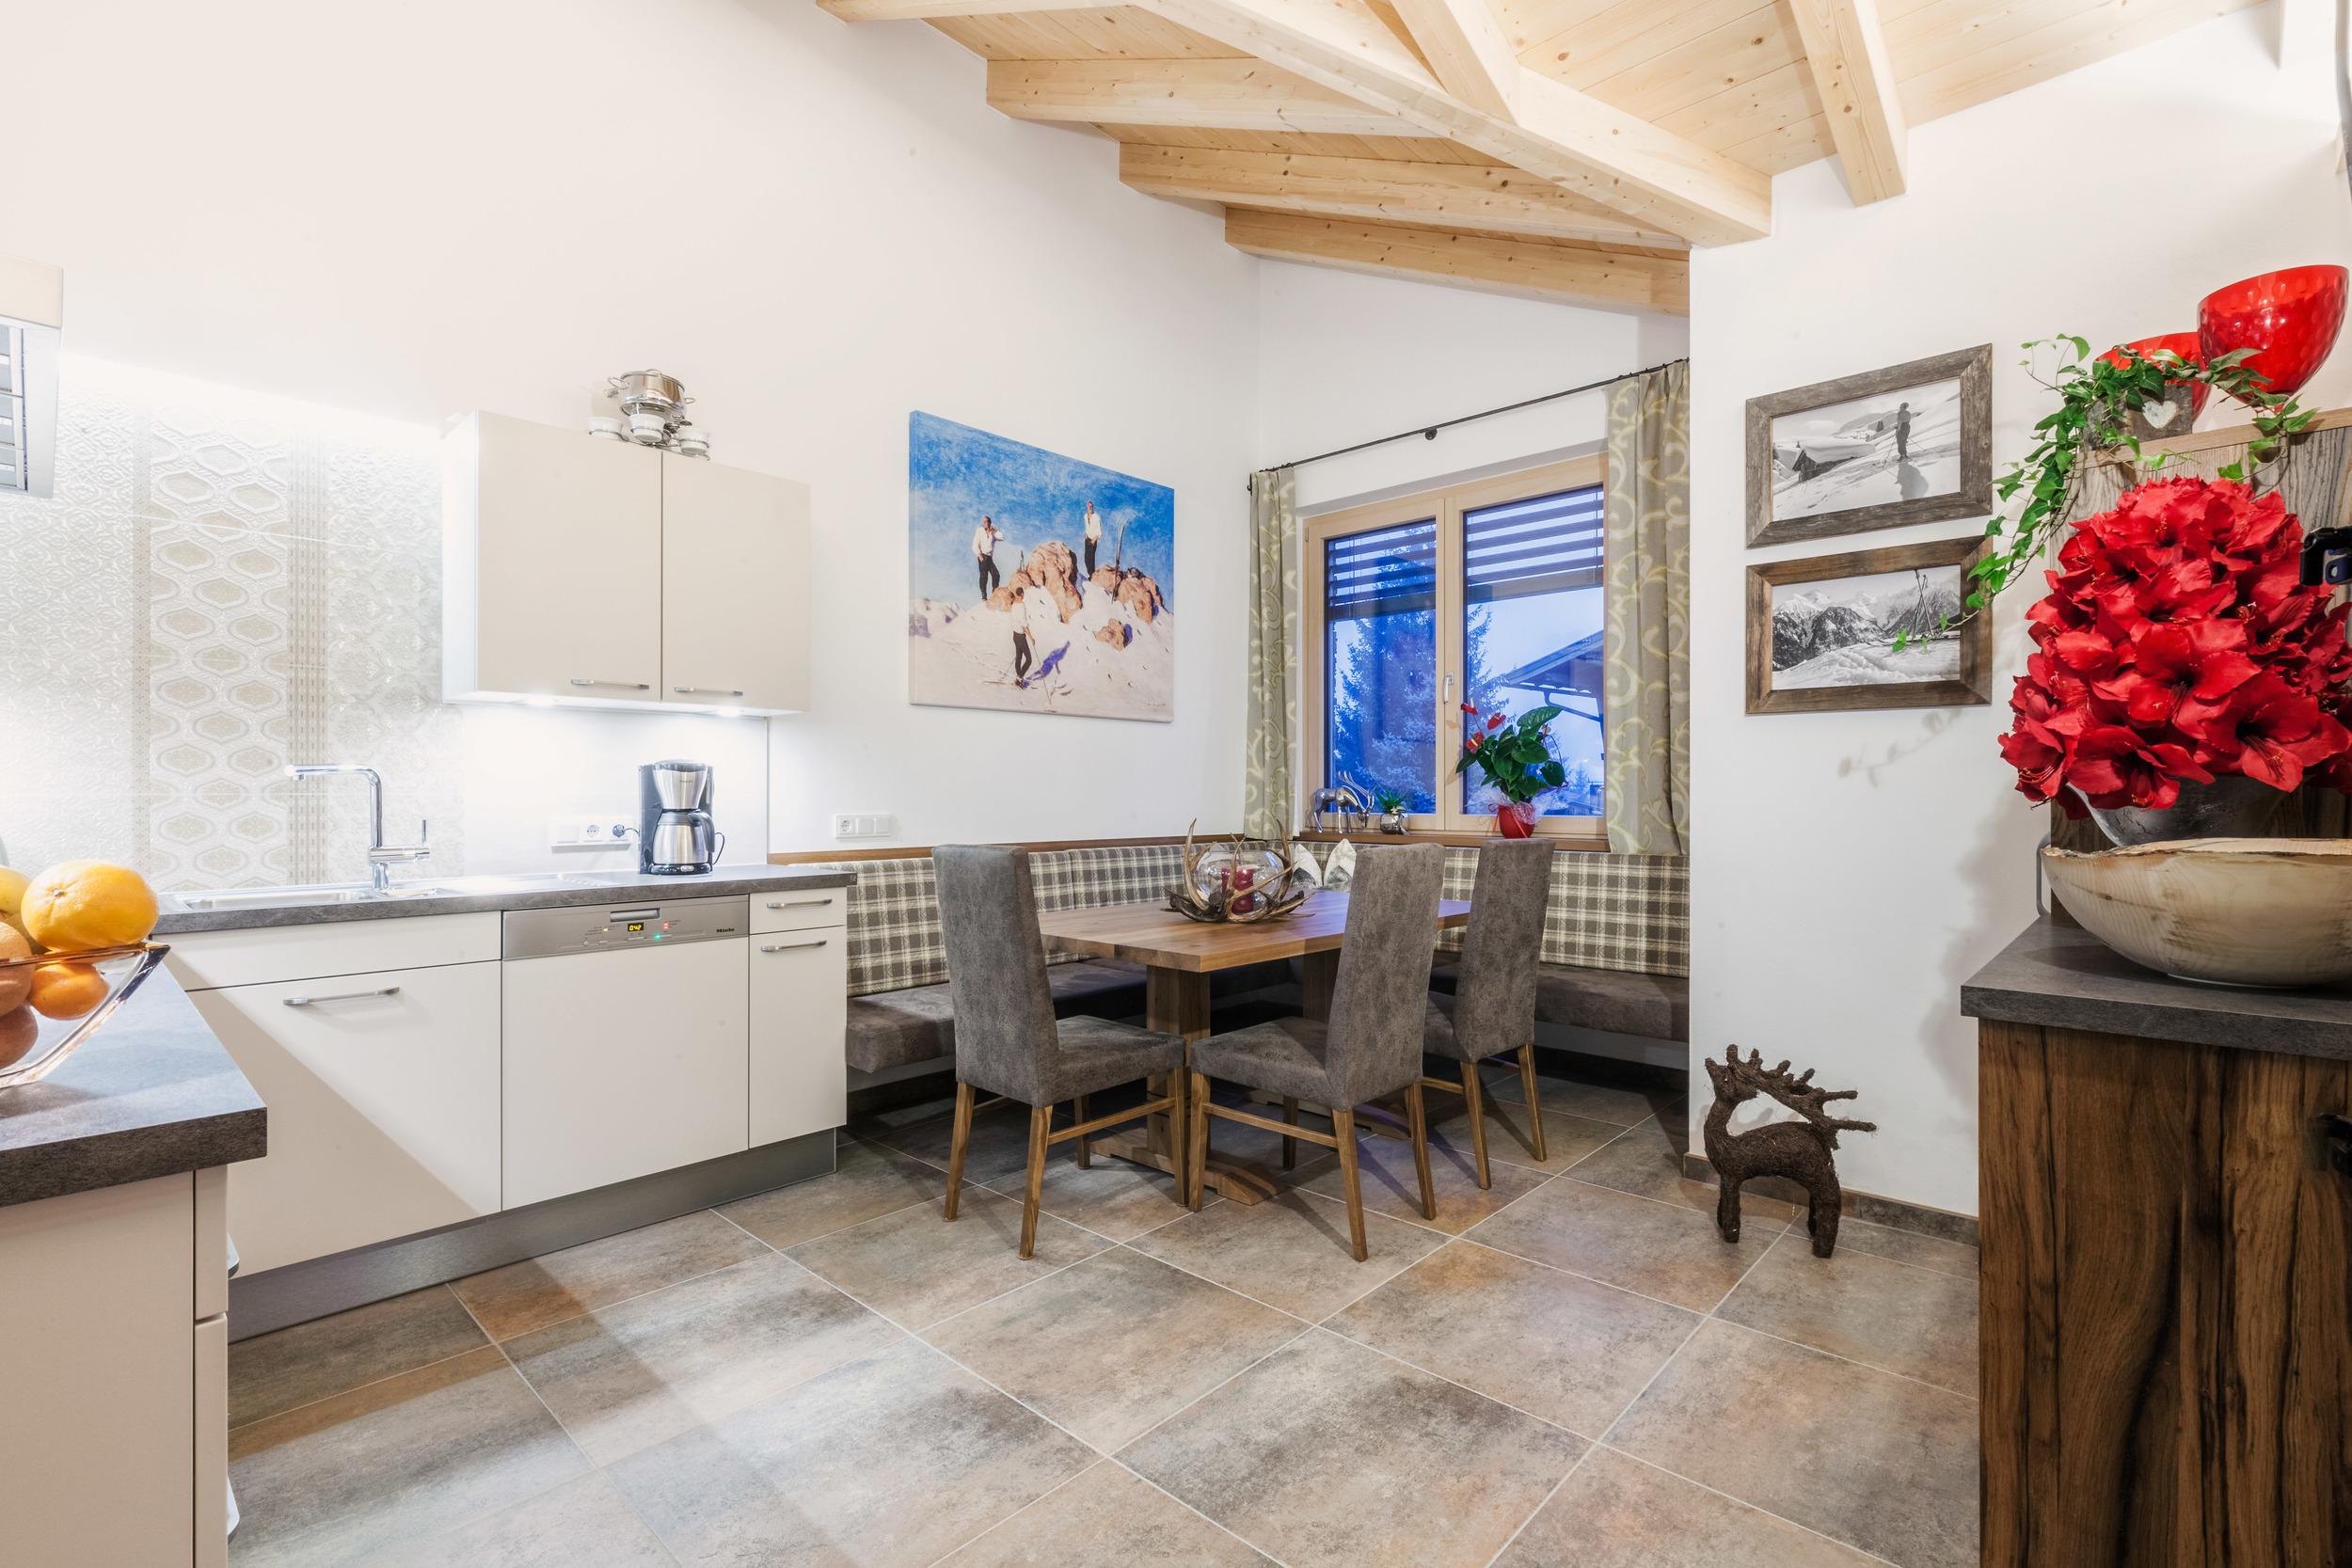 appartement-suites-liana-sophie-neukirchen-haus-architektur-kueche-8-personen